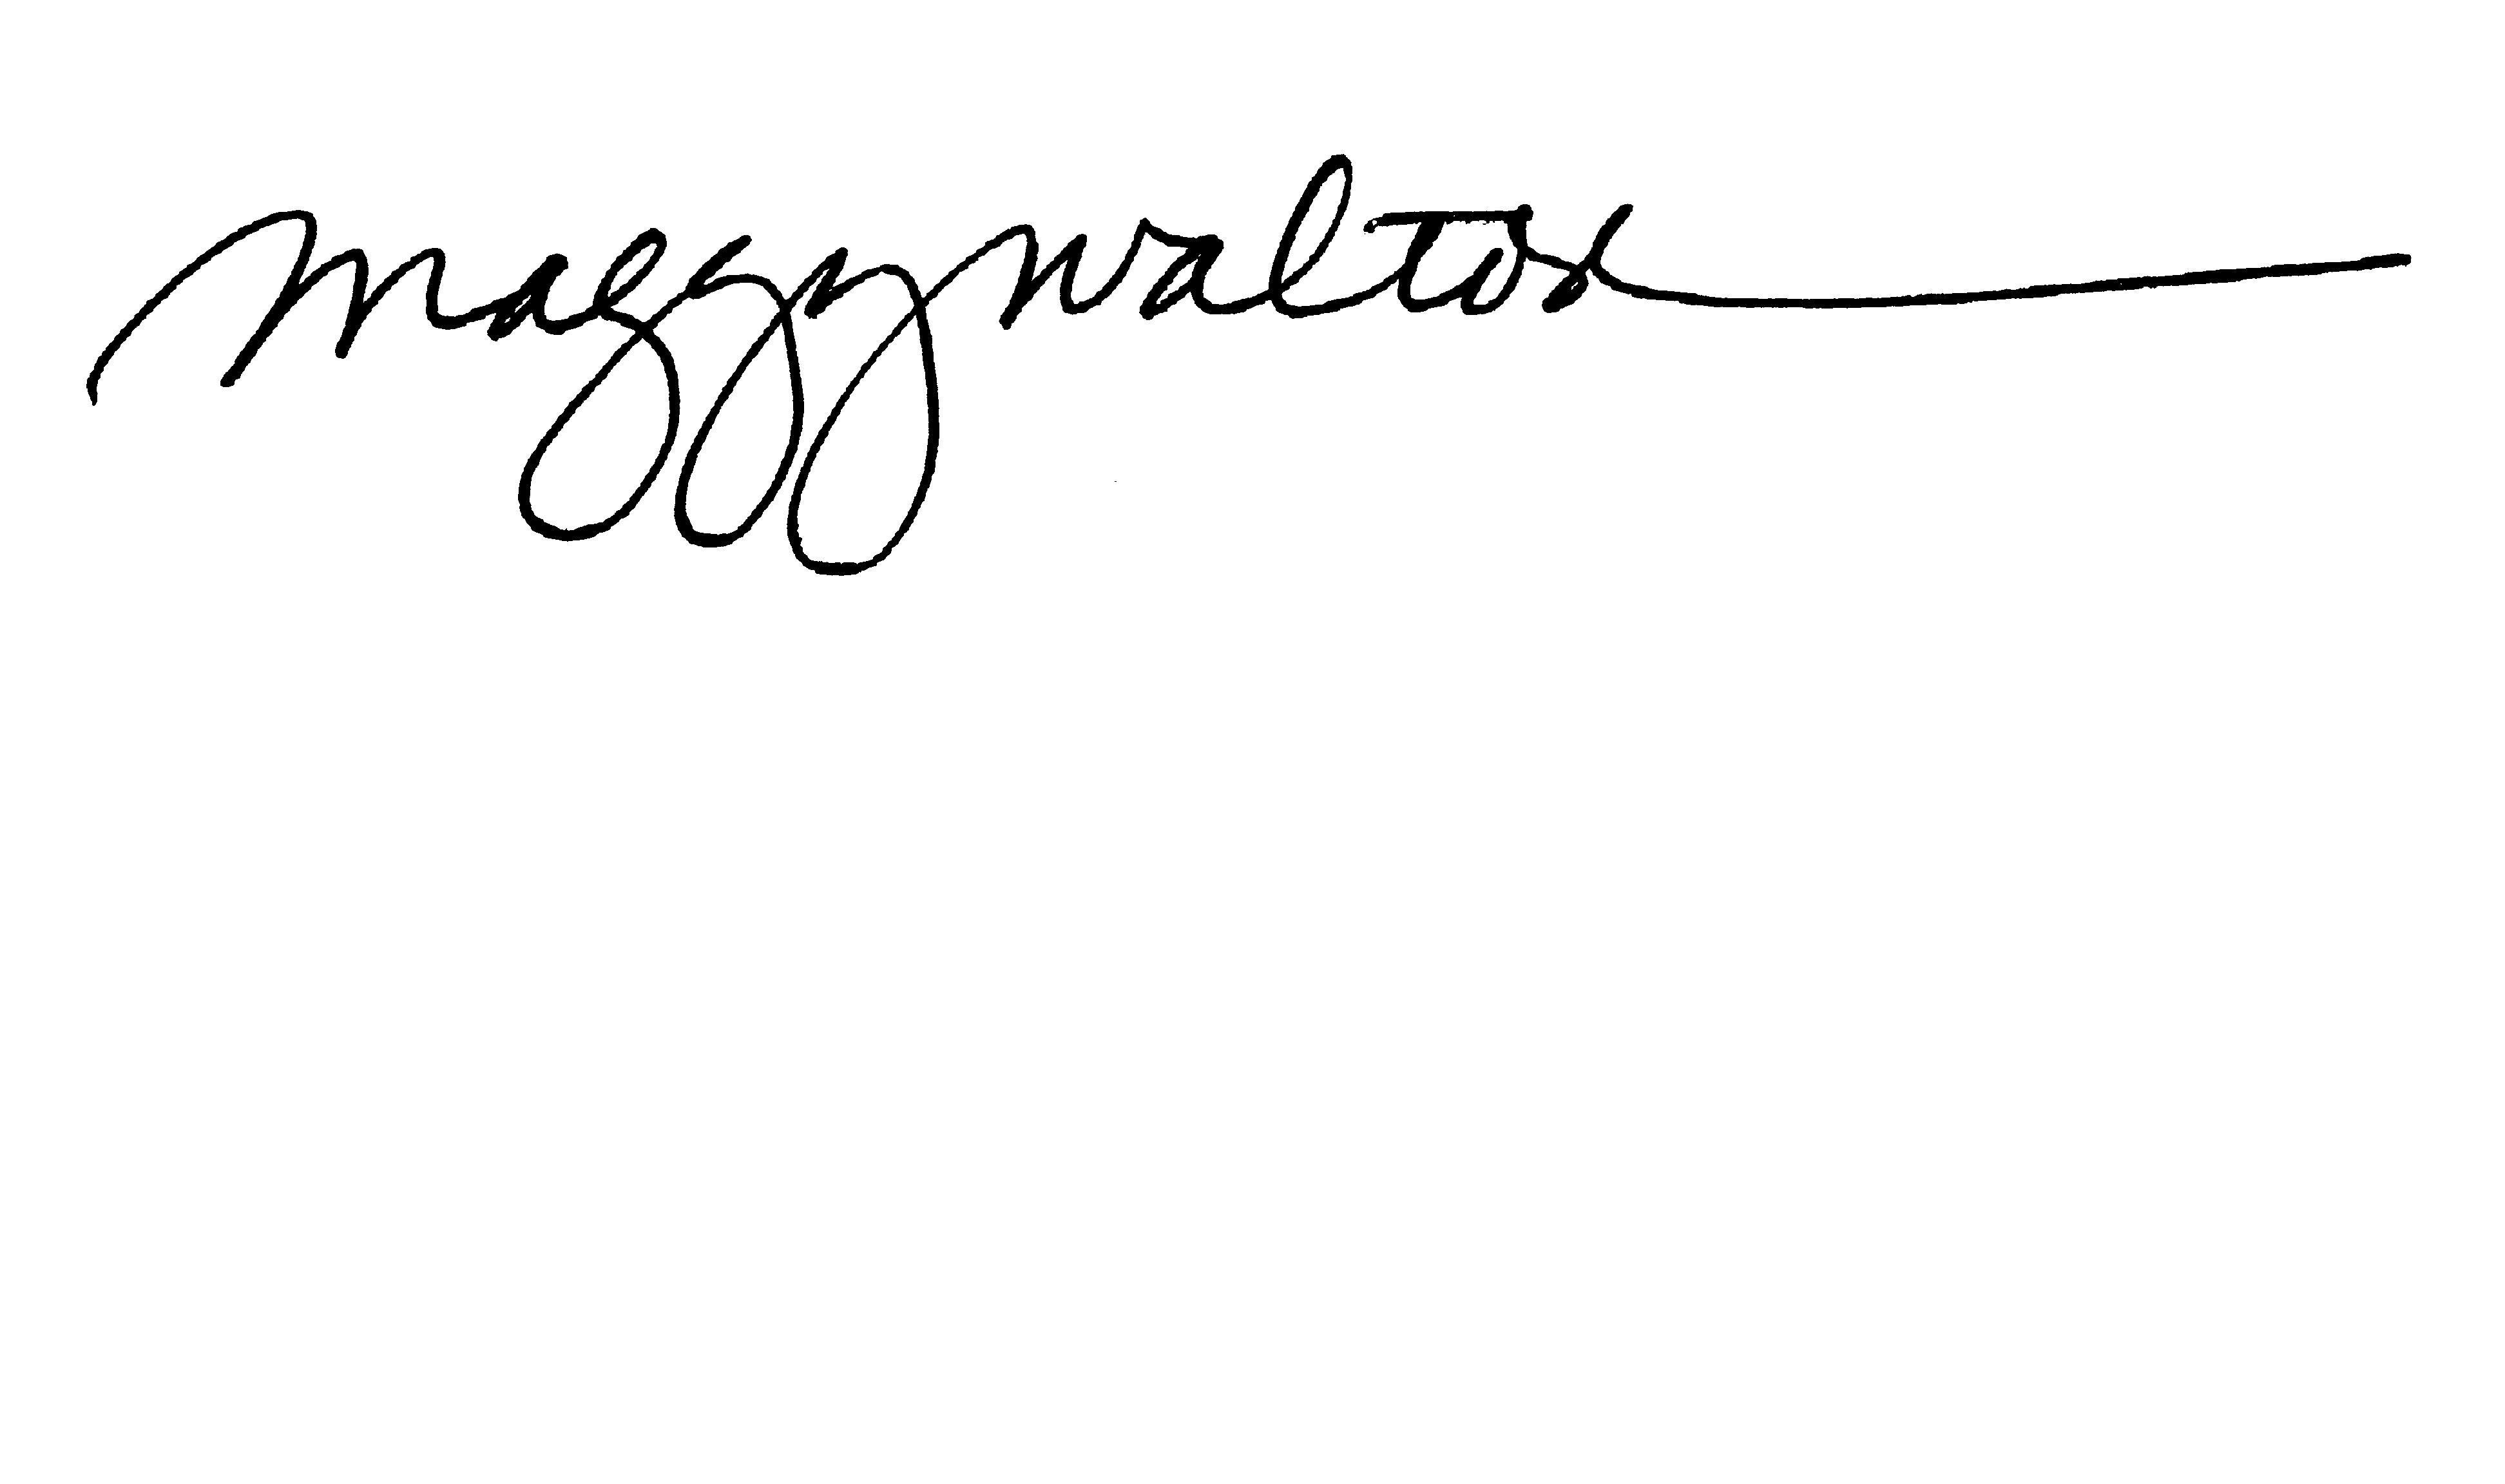 Maggy Walton's Signature